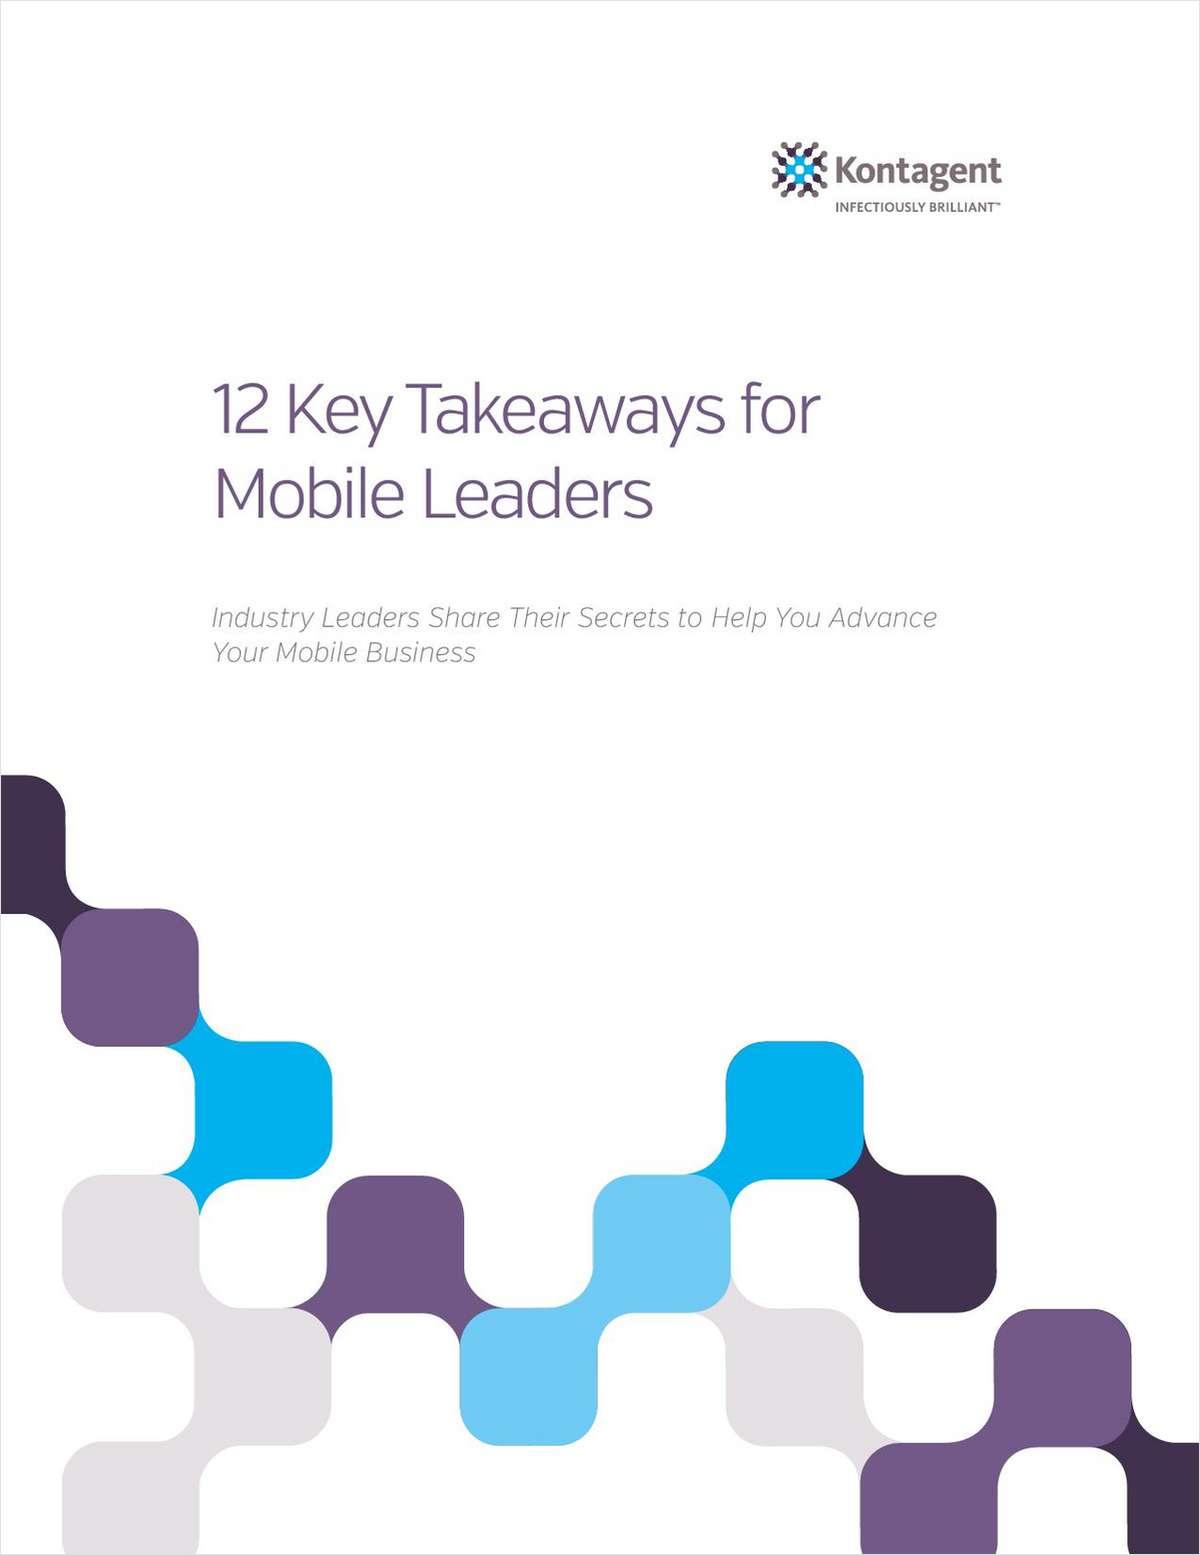 12 Key Takeaways for Mobile Leaders